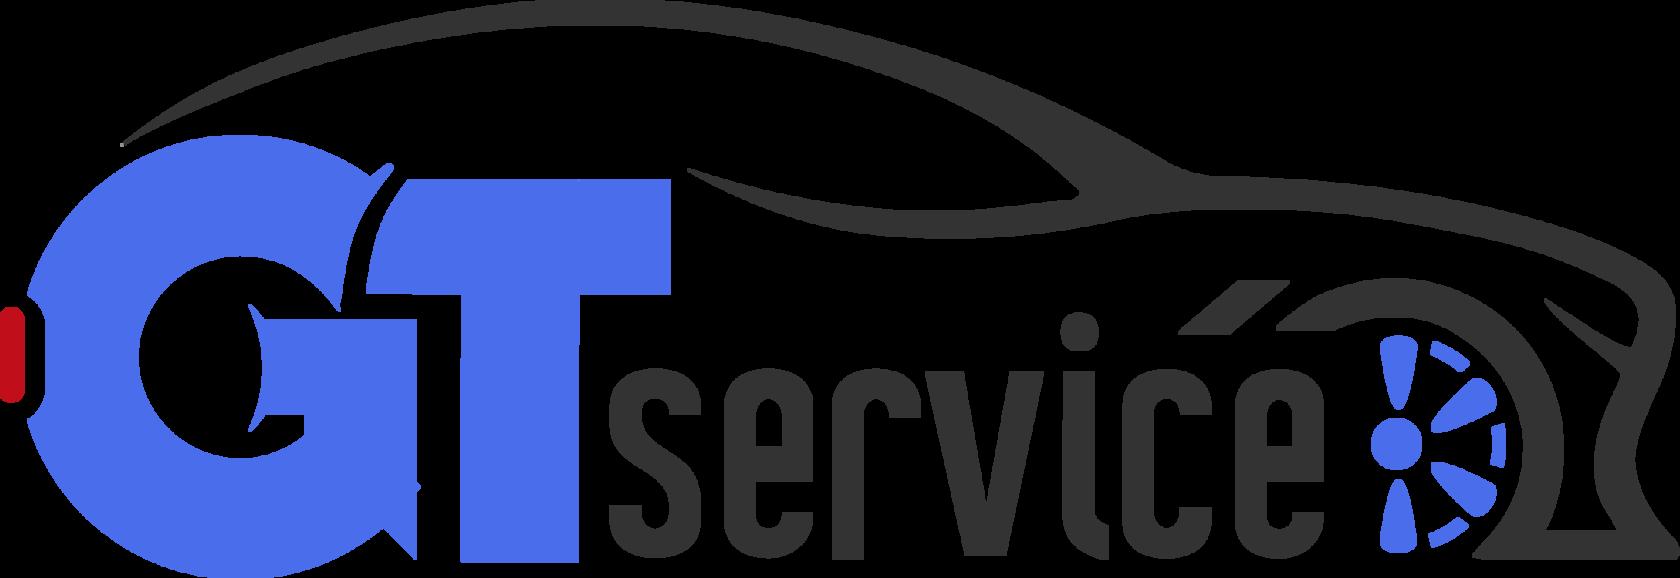 Автосервис GT-Service